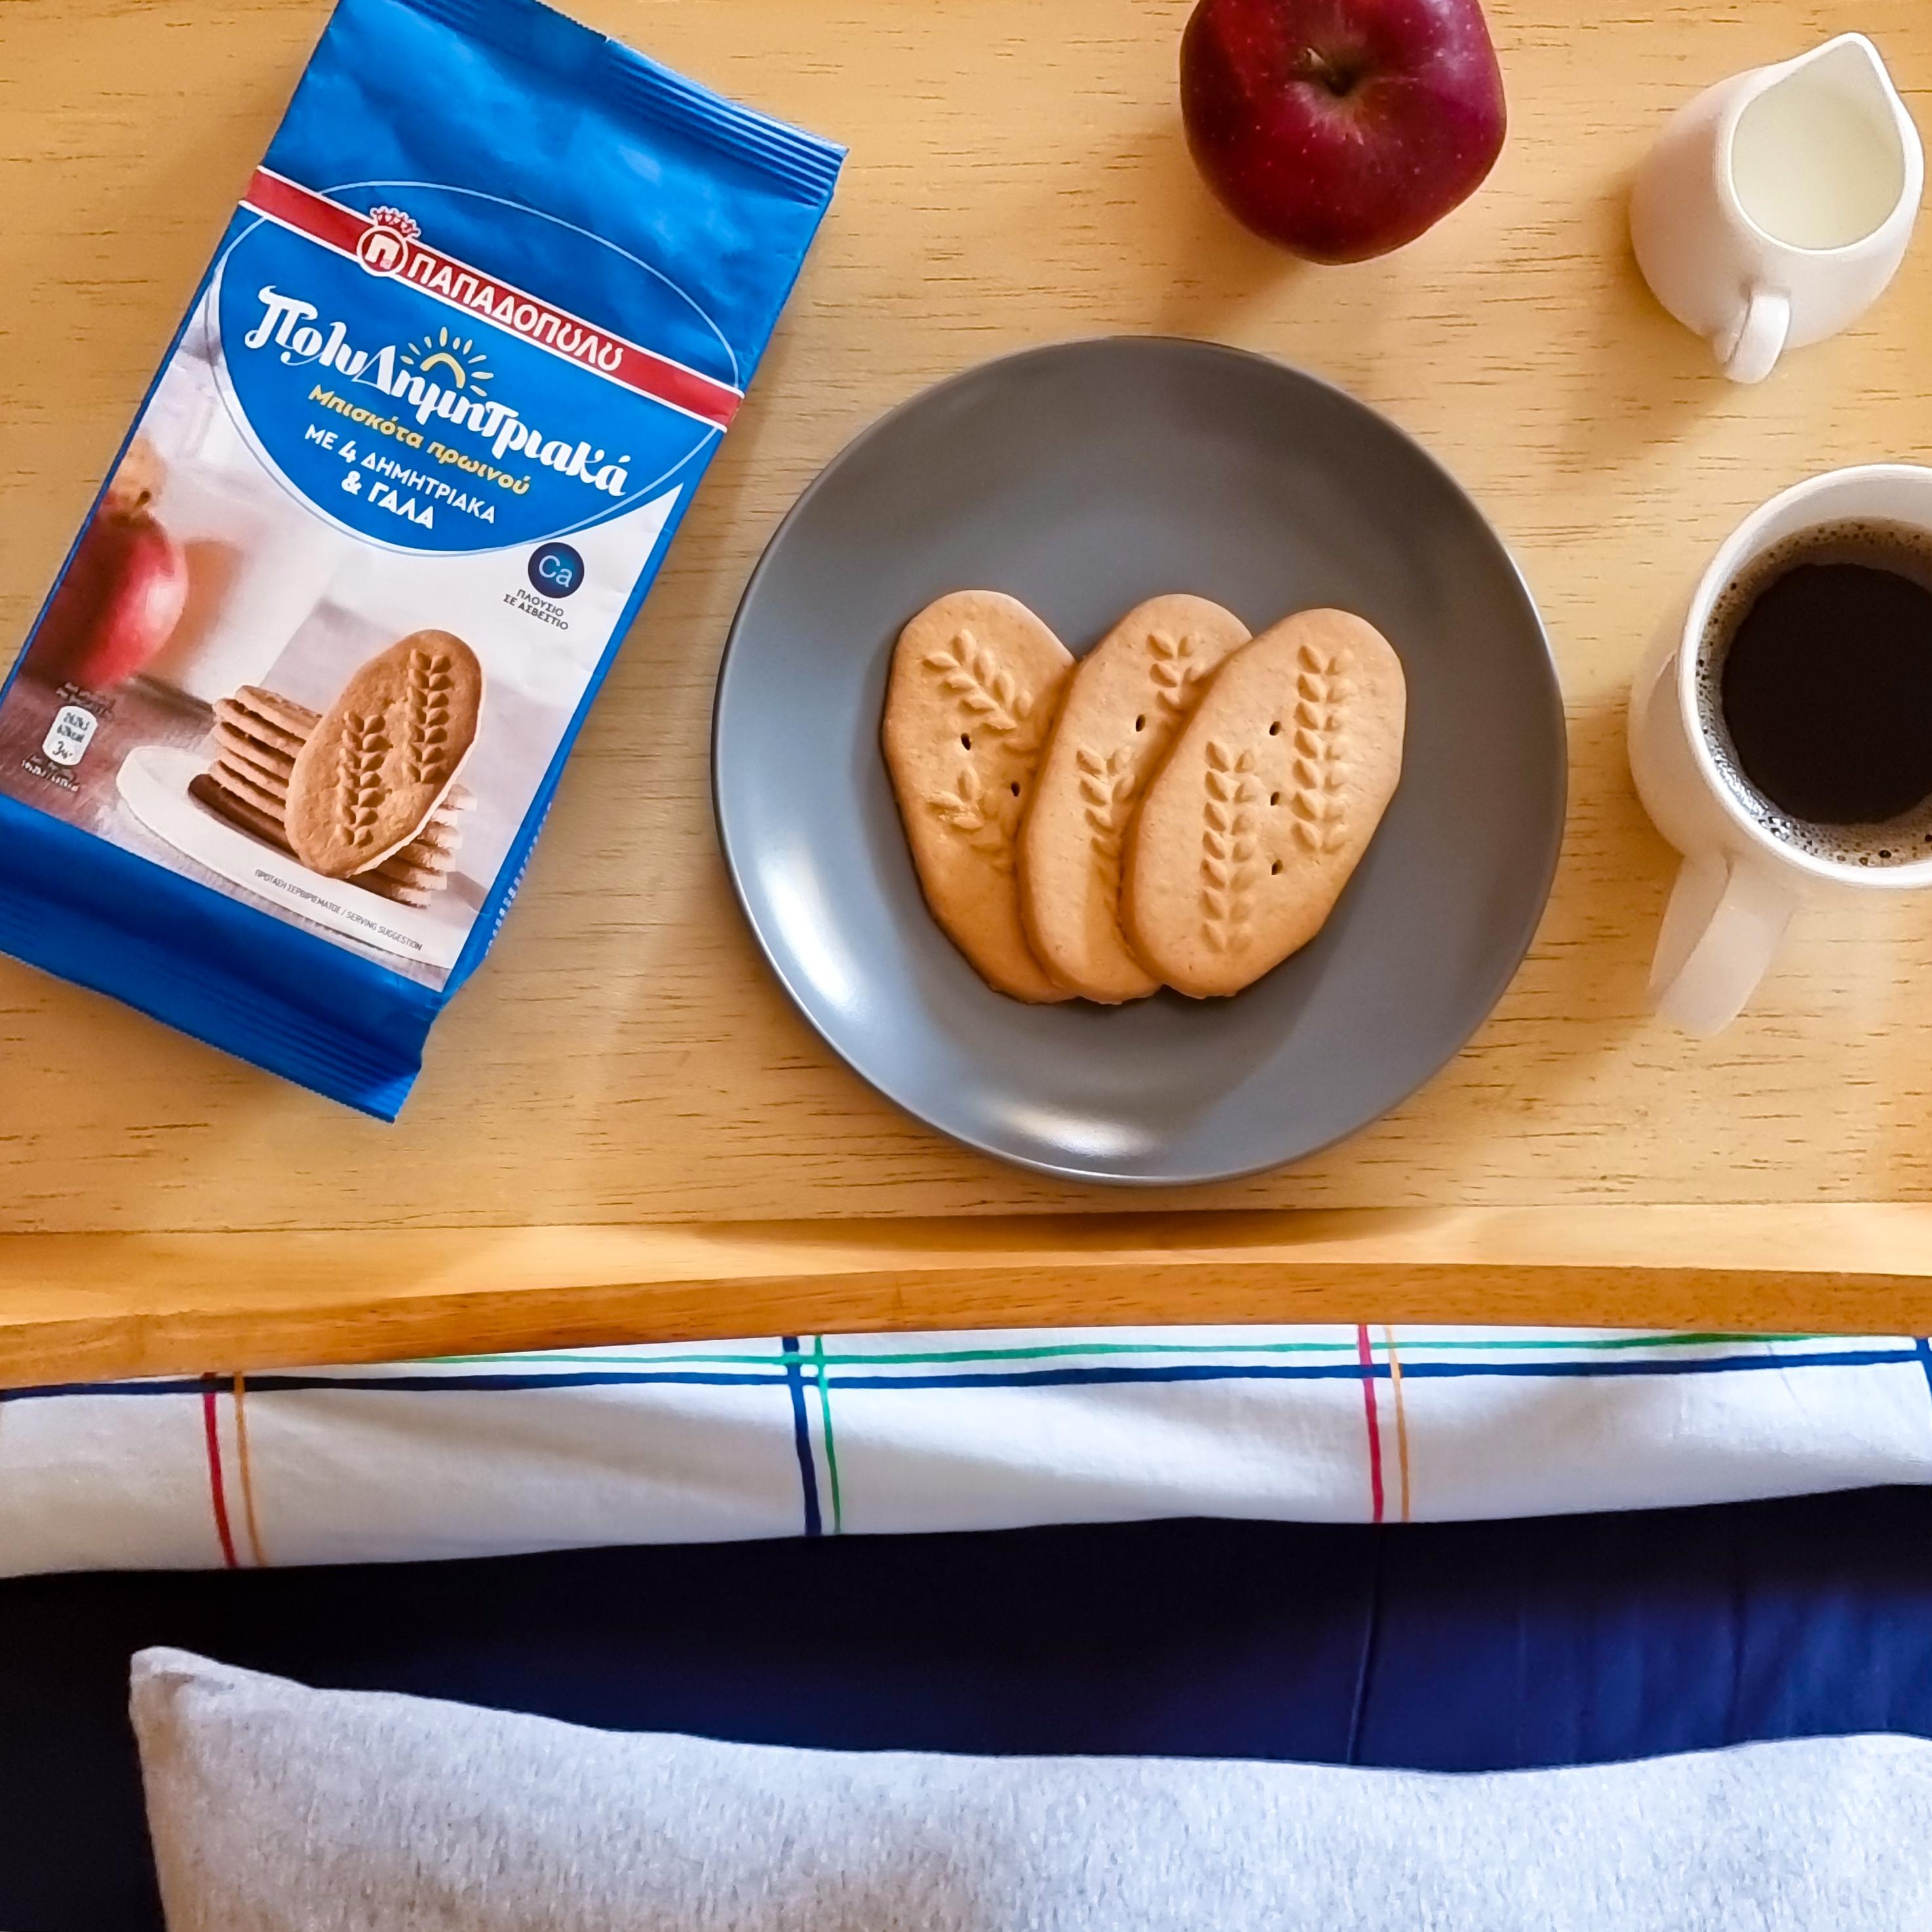 Image for ΠολυΔημητριακά μπισκότα, ένα φρούτο, καφές κι έτοιμο το πρωινό!